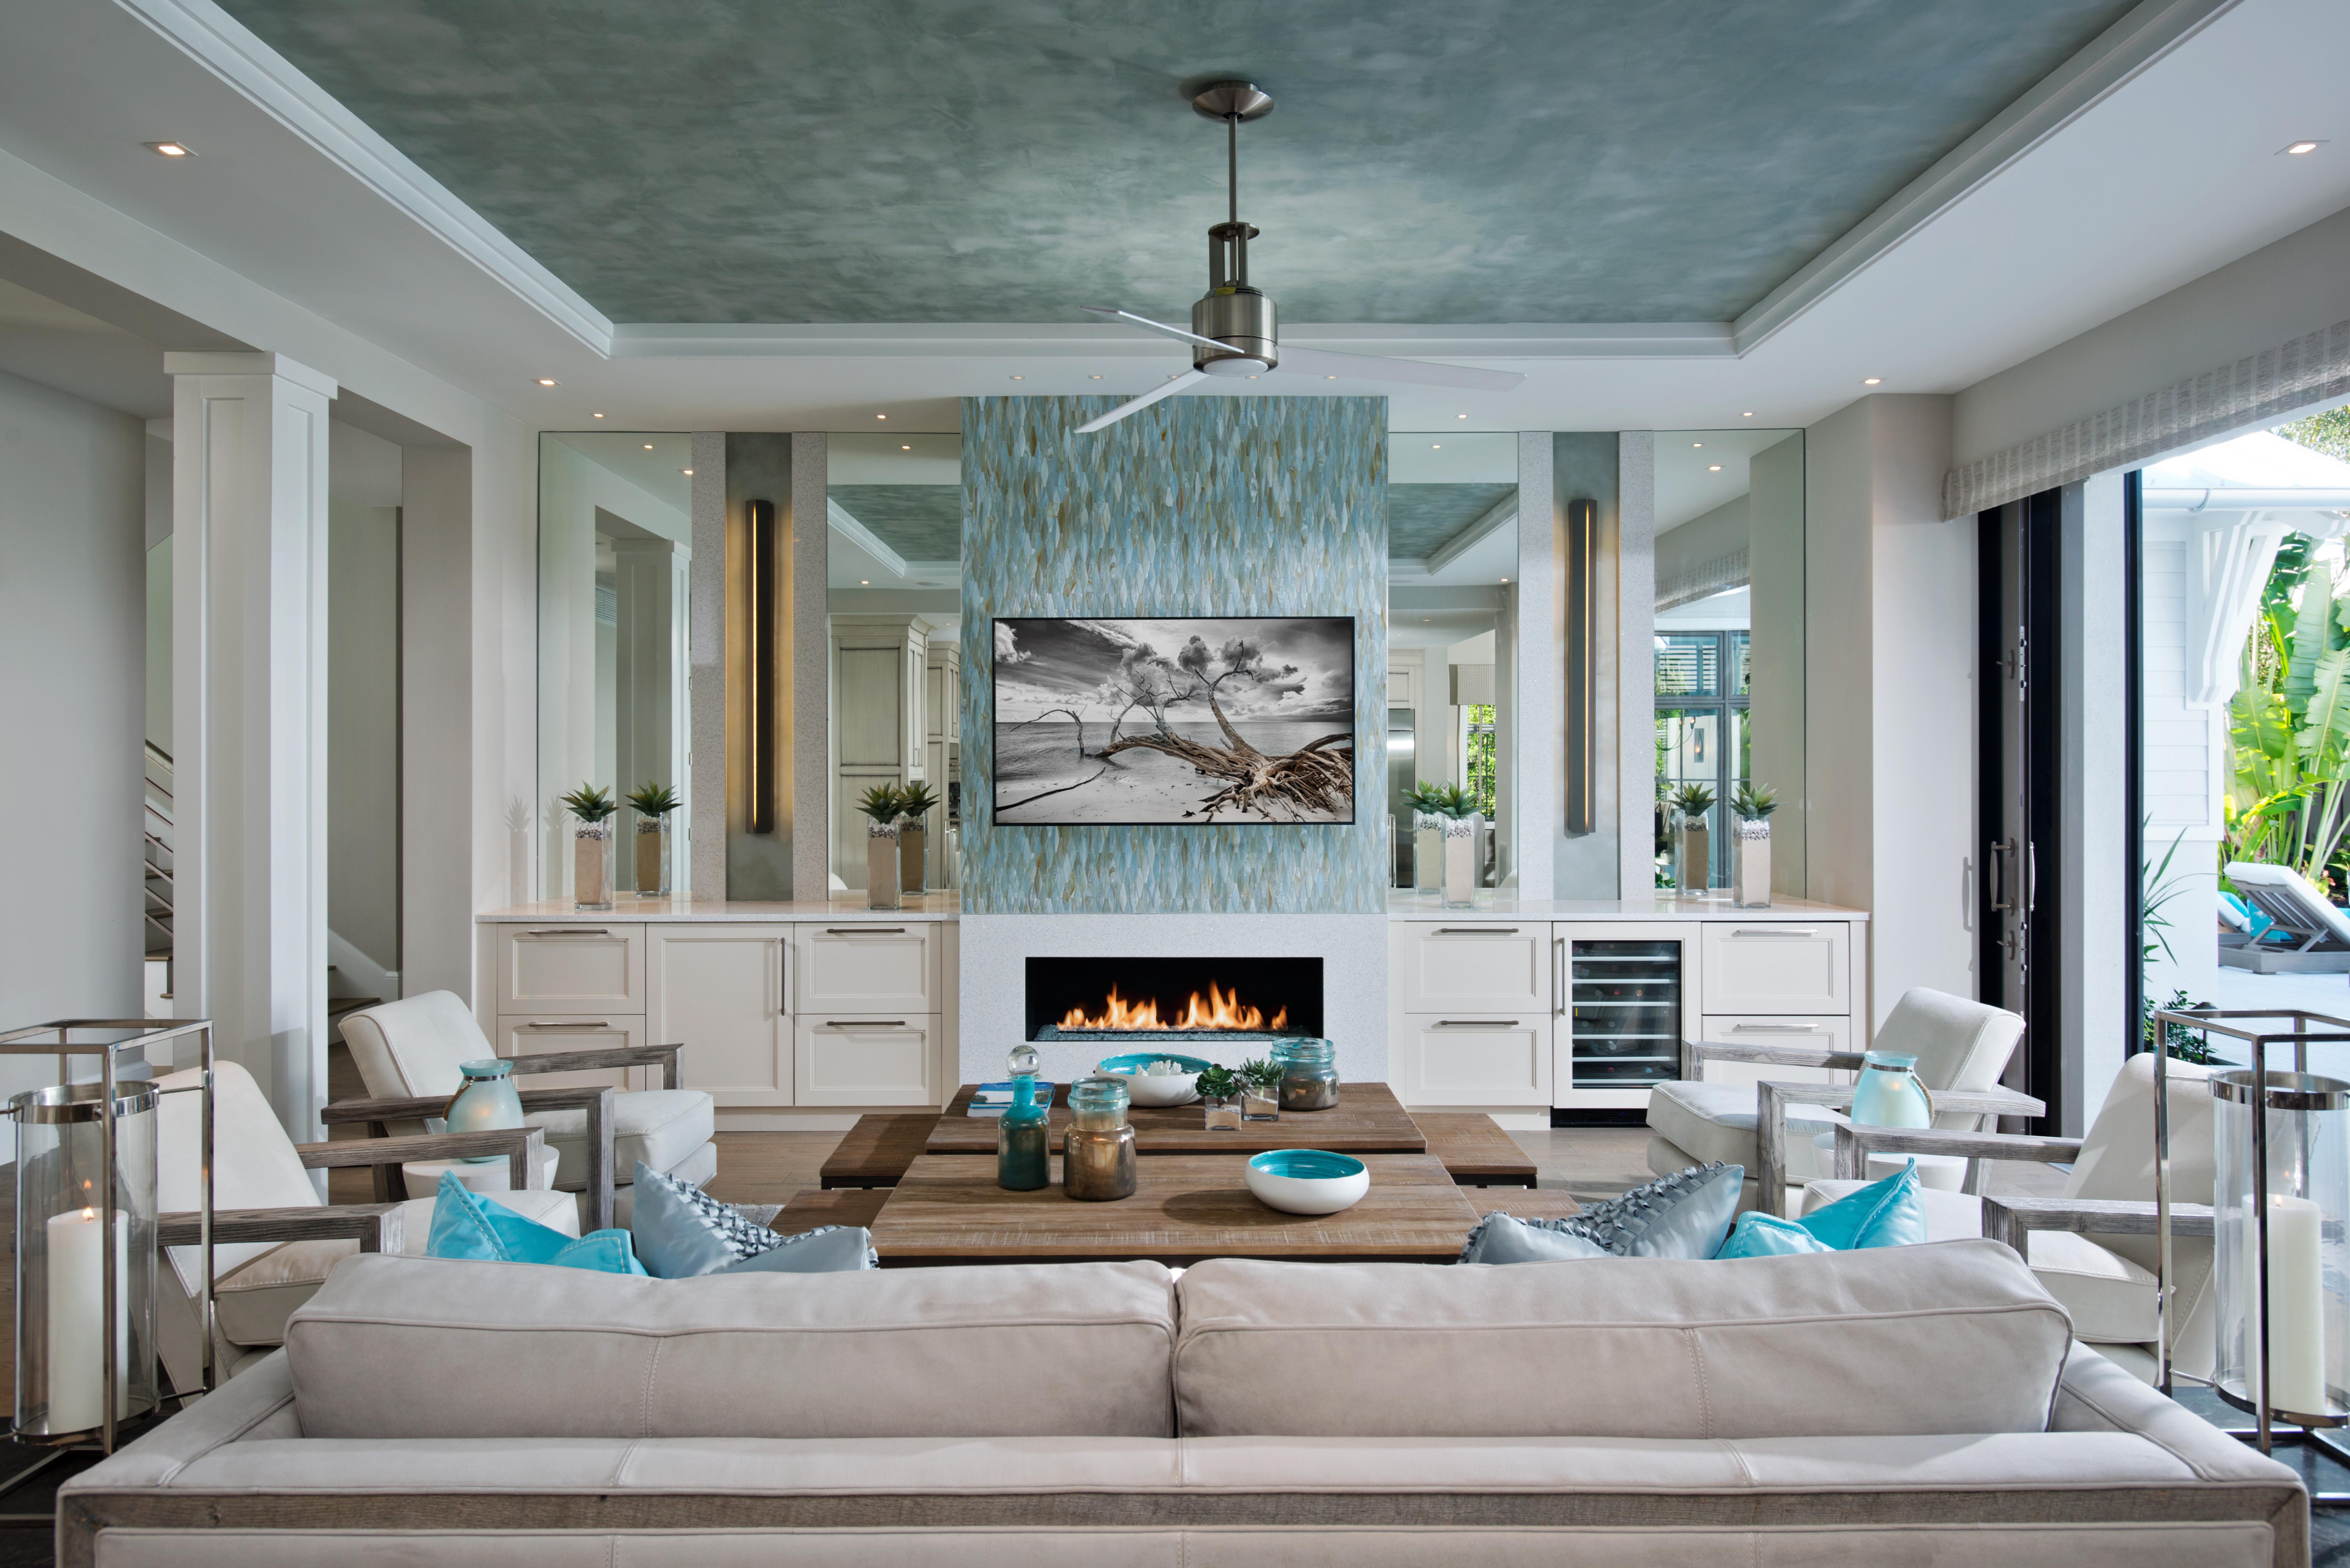 Naples Fl Interior Design Photographer Randall Perry